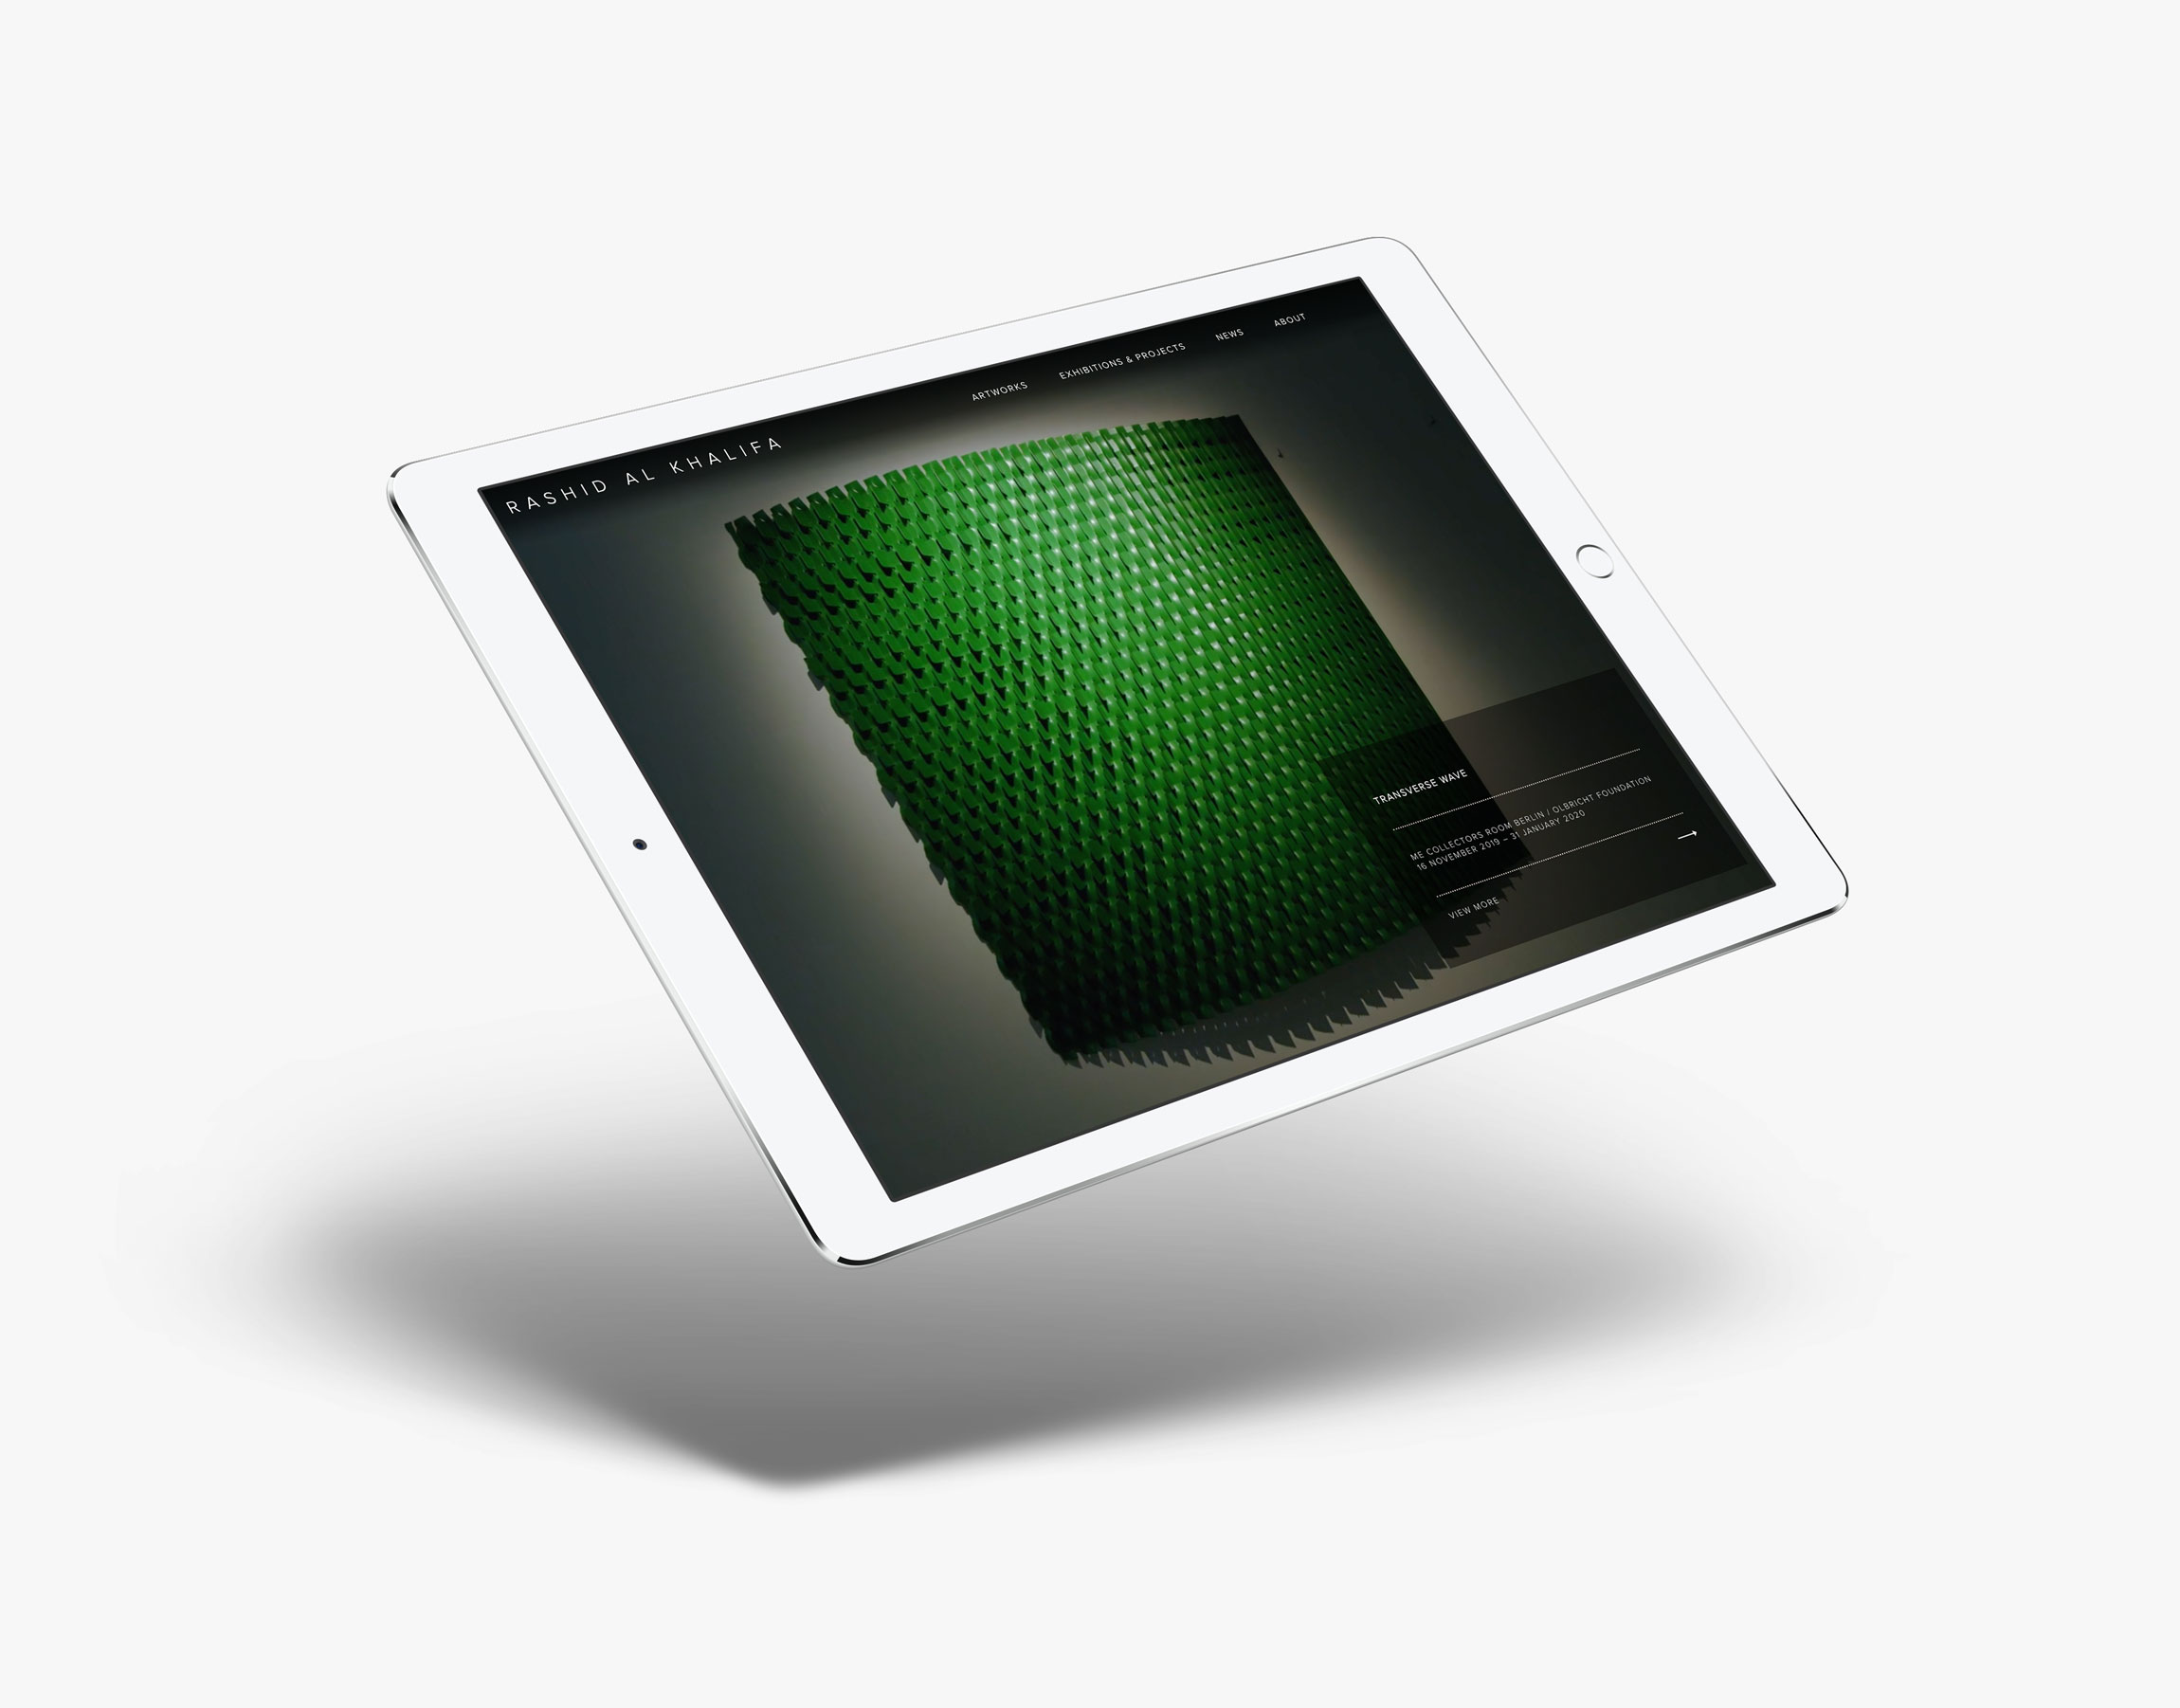 web design image for Rashid al Khalifa